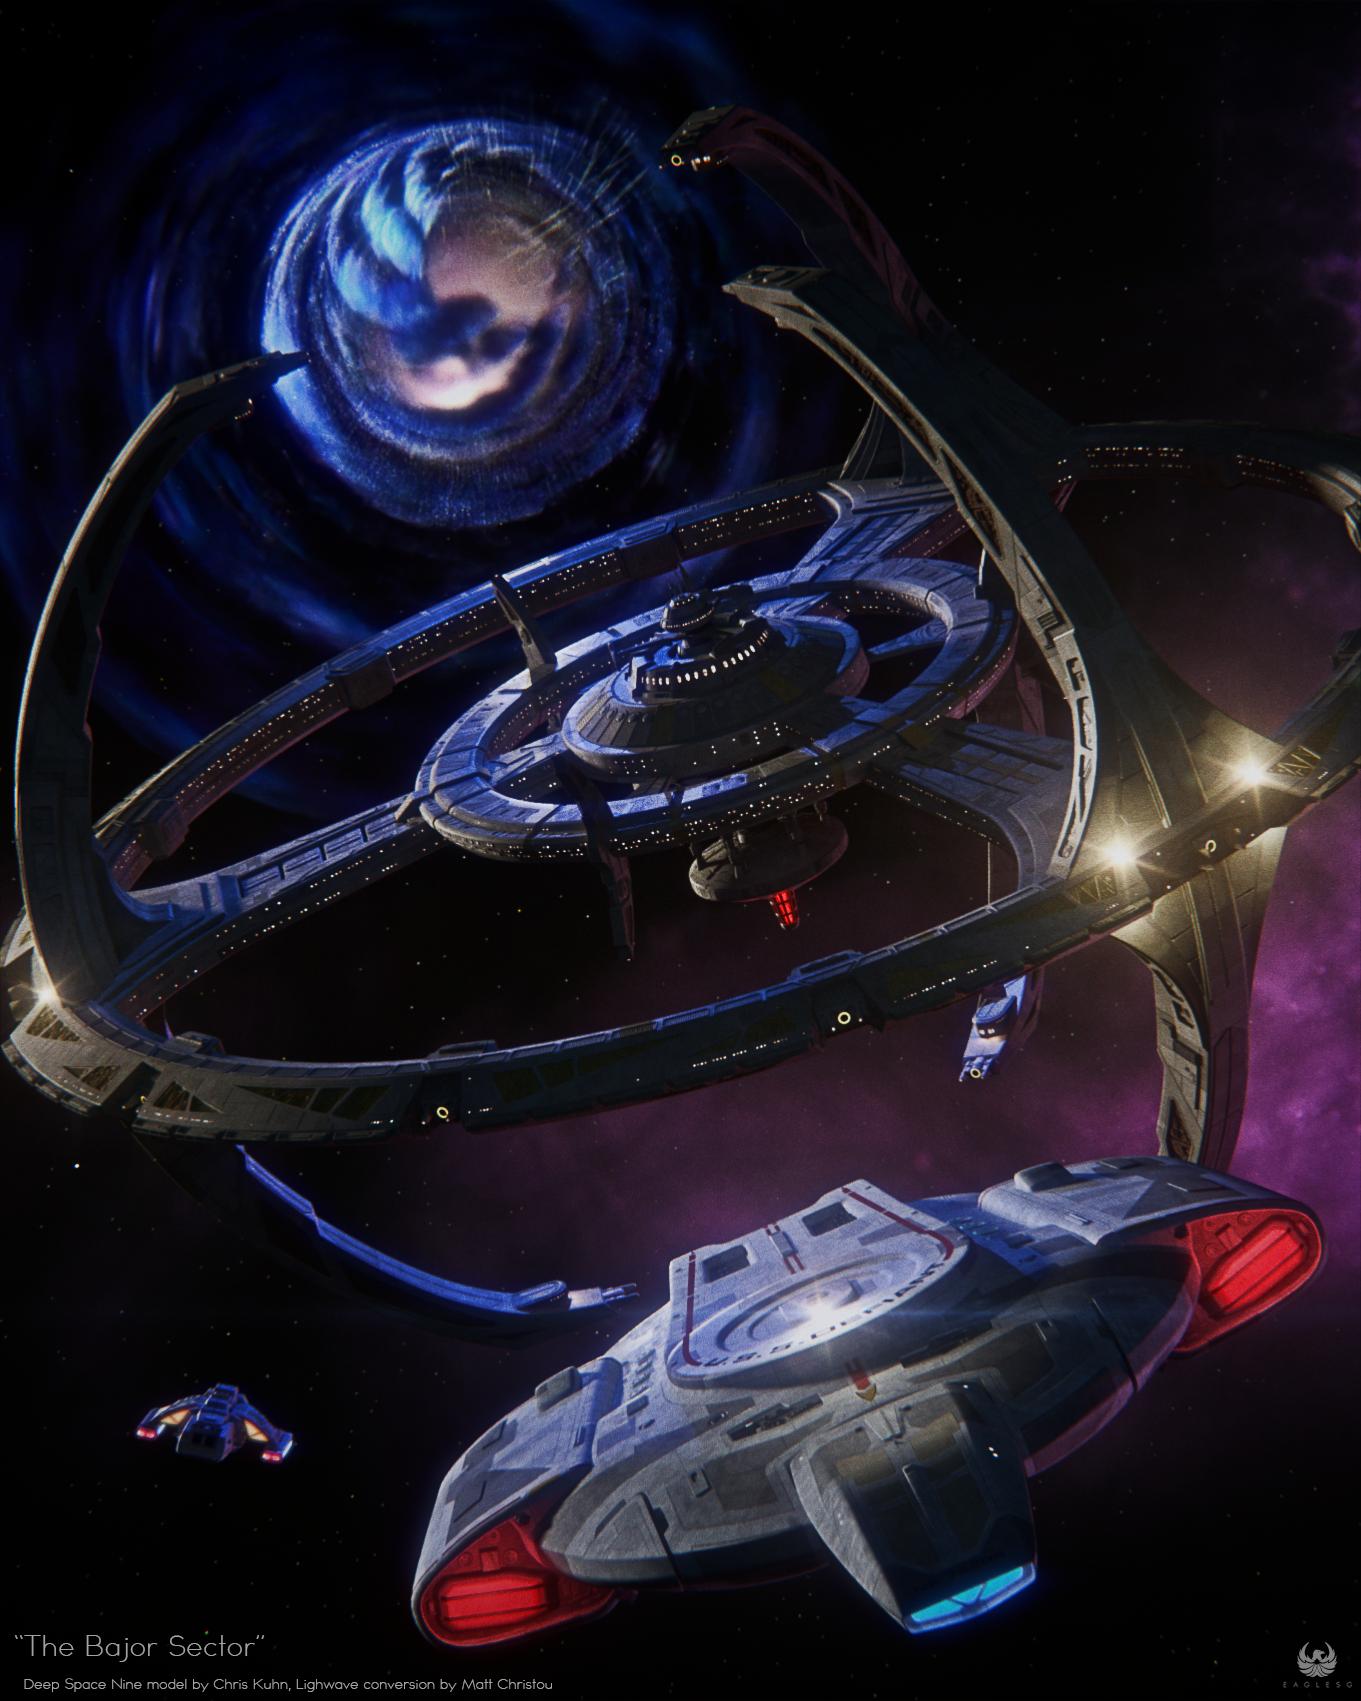 The Bajor Sector